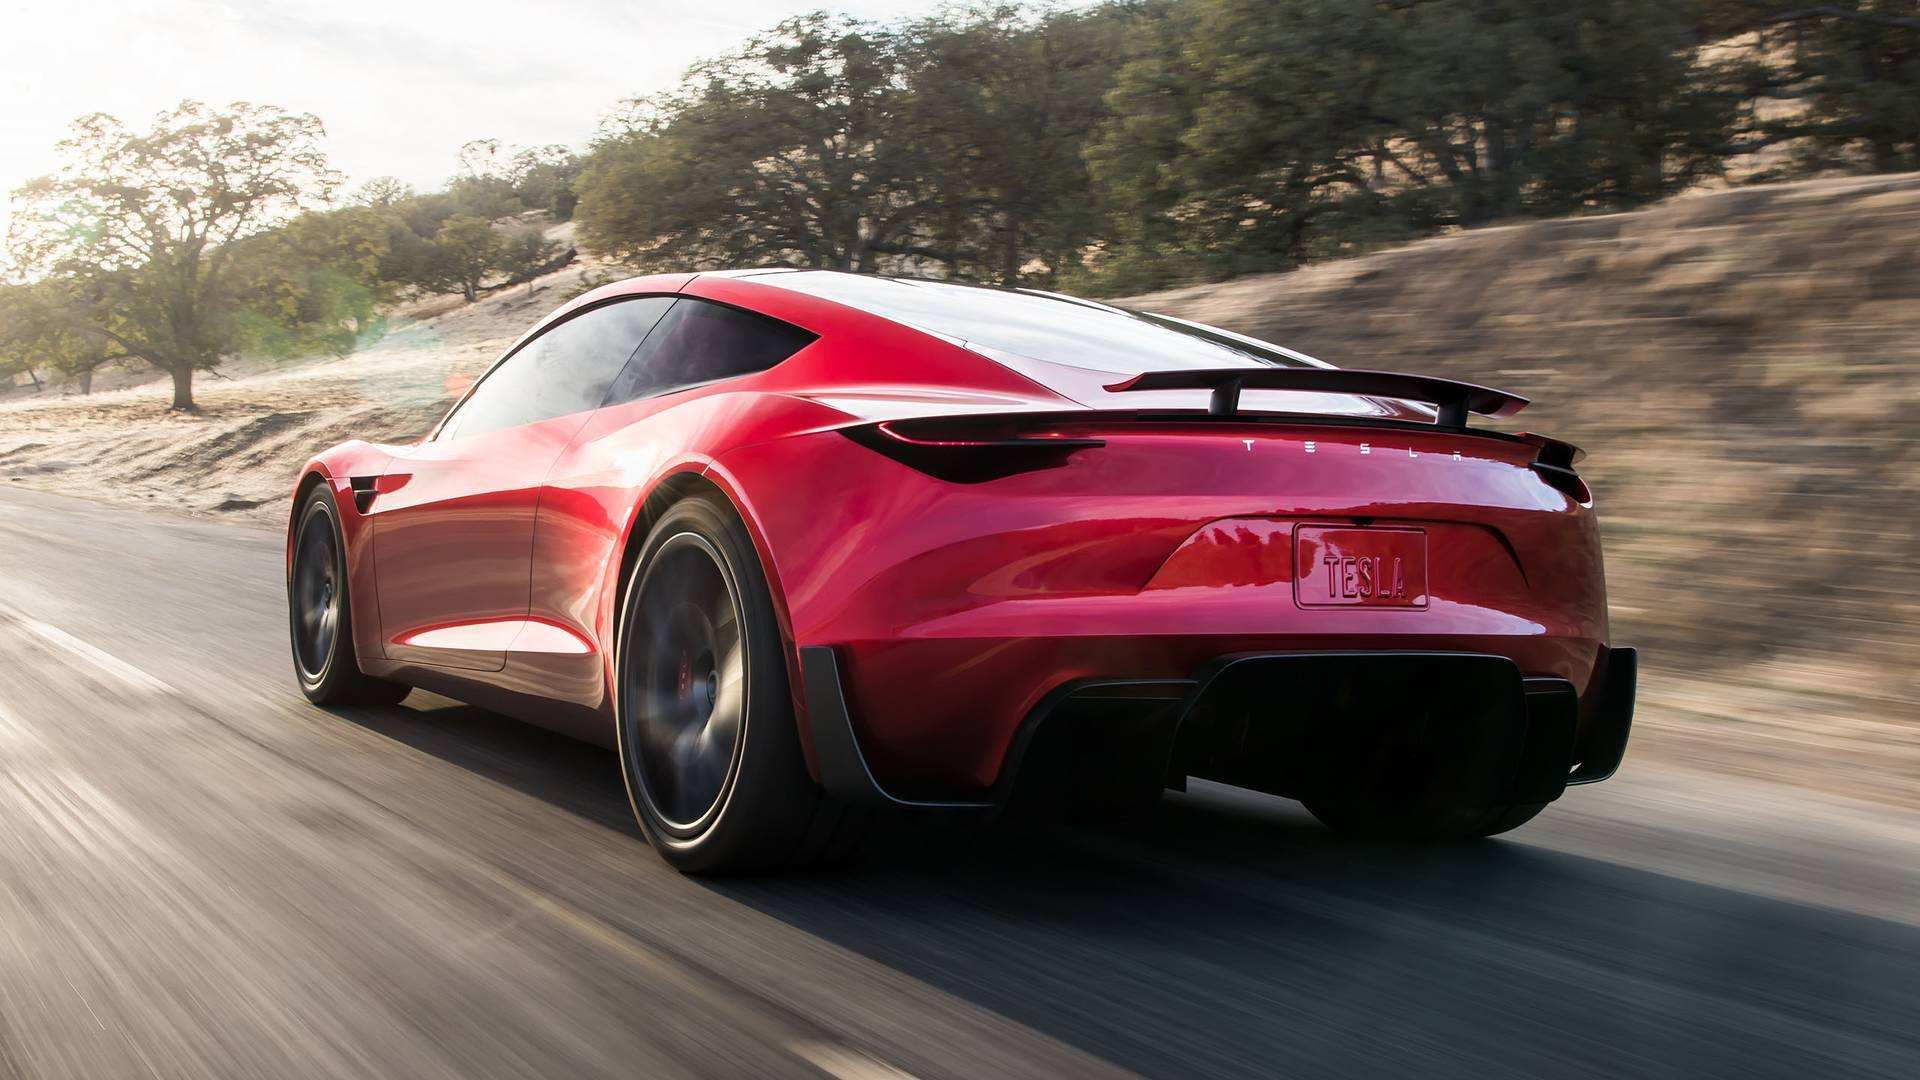 37 All New 2020 Tesla Roadster Torque Picture for 2020 Tesla Roadster Torque